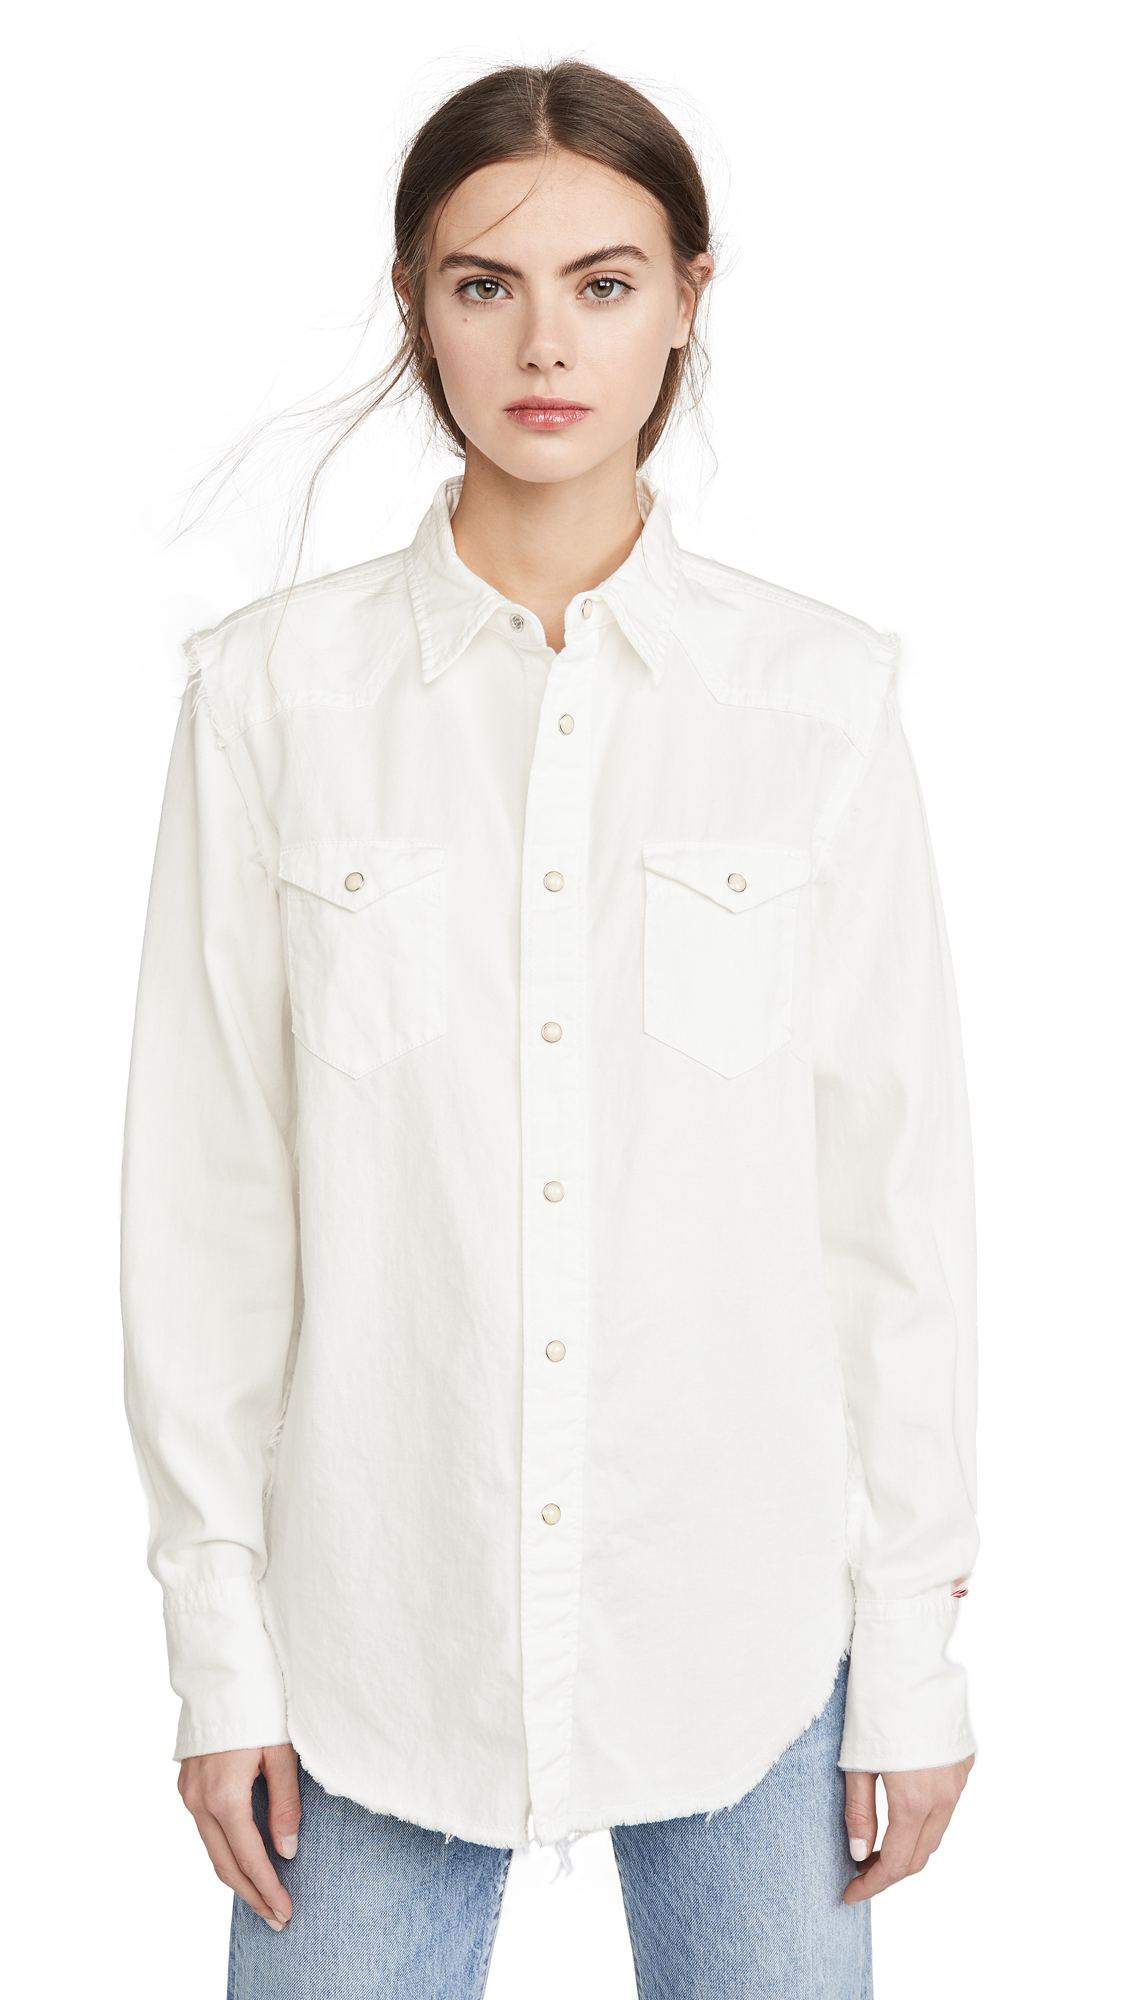 Denimist Oversized Cowboy Shirt - 30% Off Sale